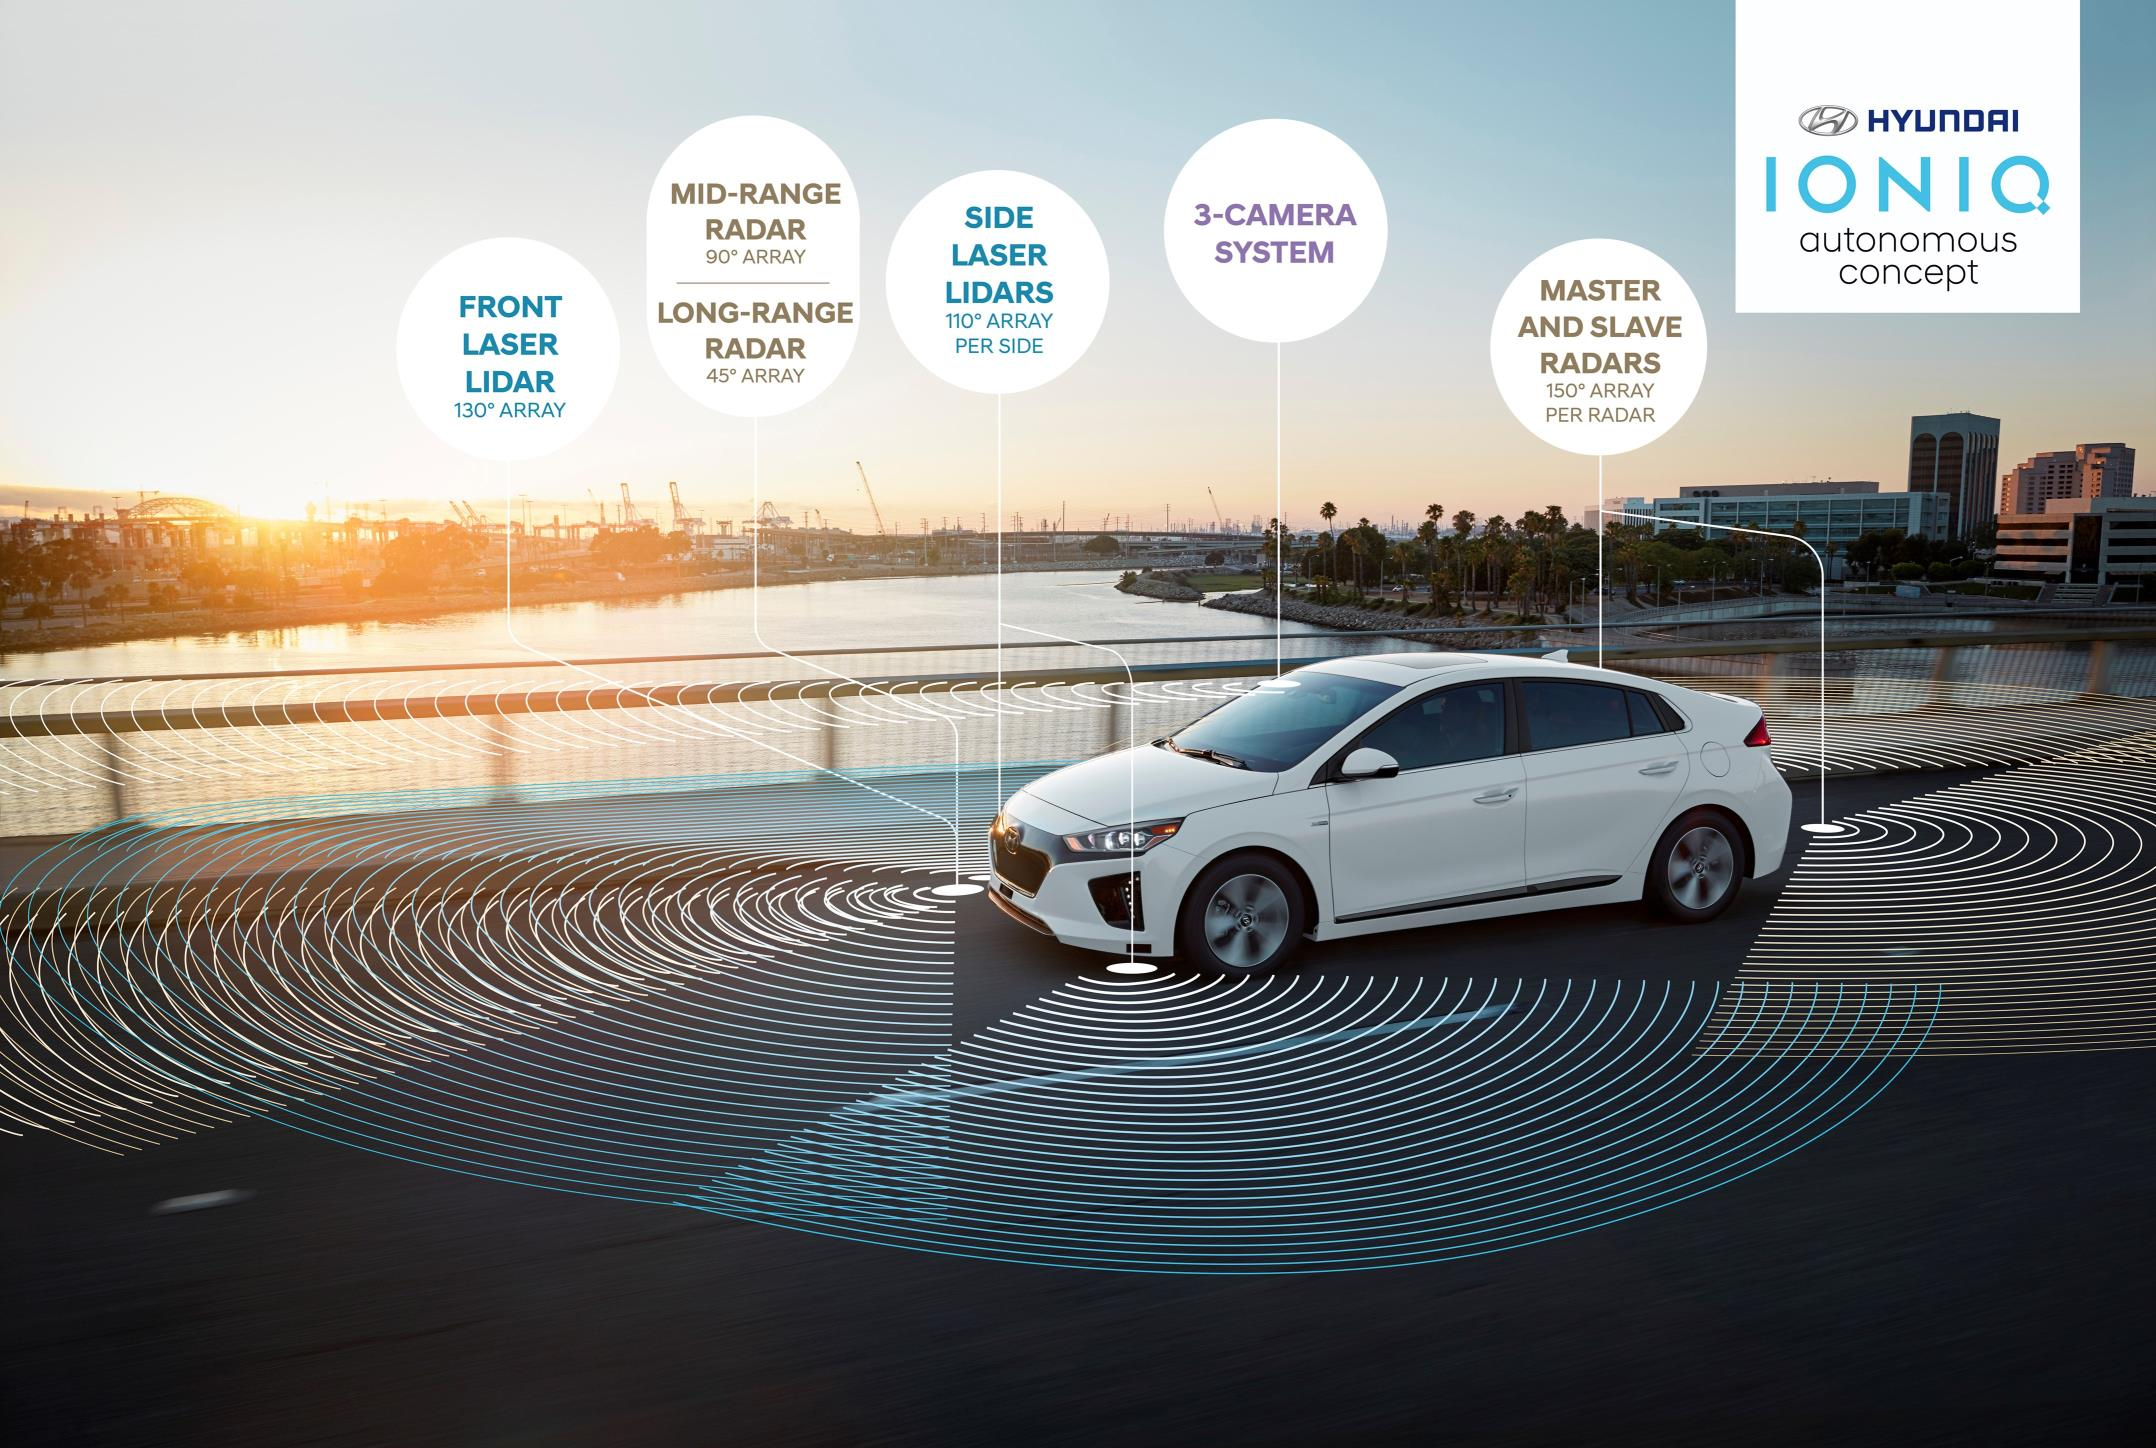 Hyundai IONIQ Autonomous Concept Vehicle